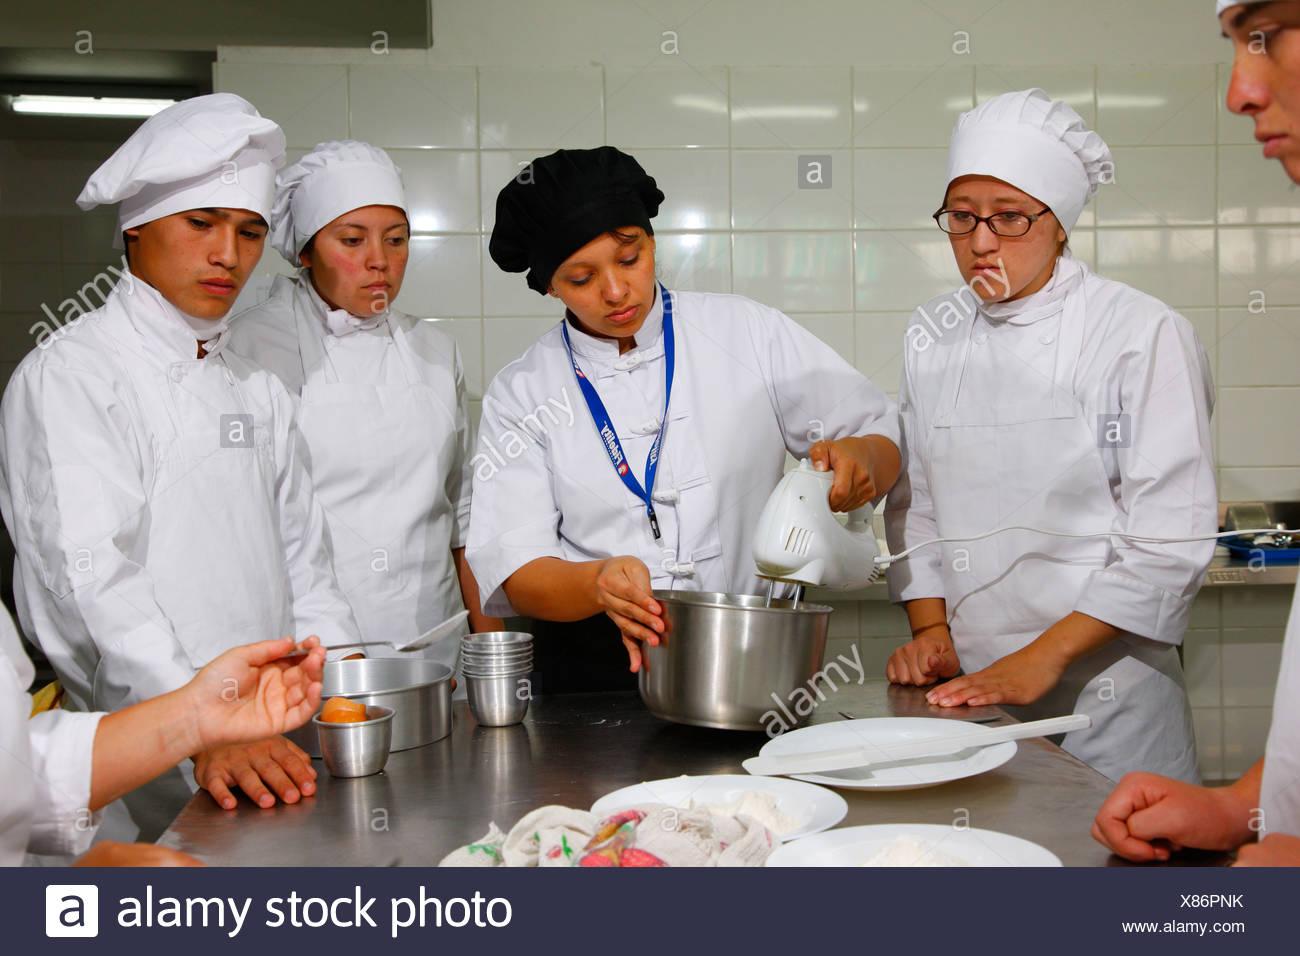 Young people, apprenticeship as a cook and baker, Fundación Cristo Vive, Santiago de Chile, Chile, South America - Stock Image